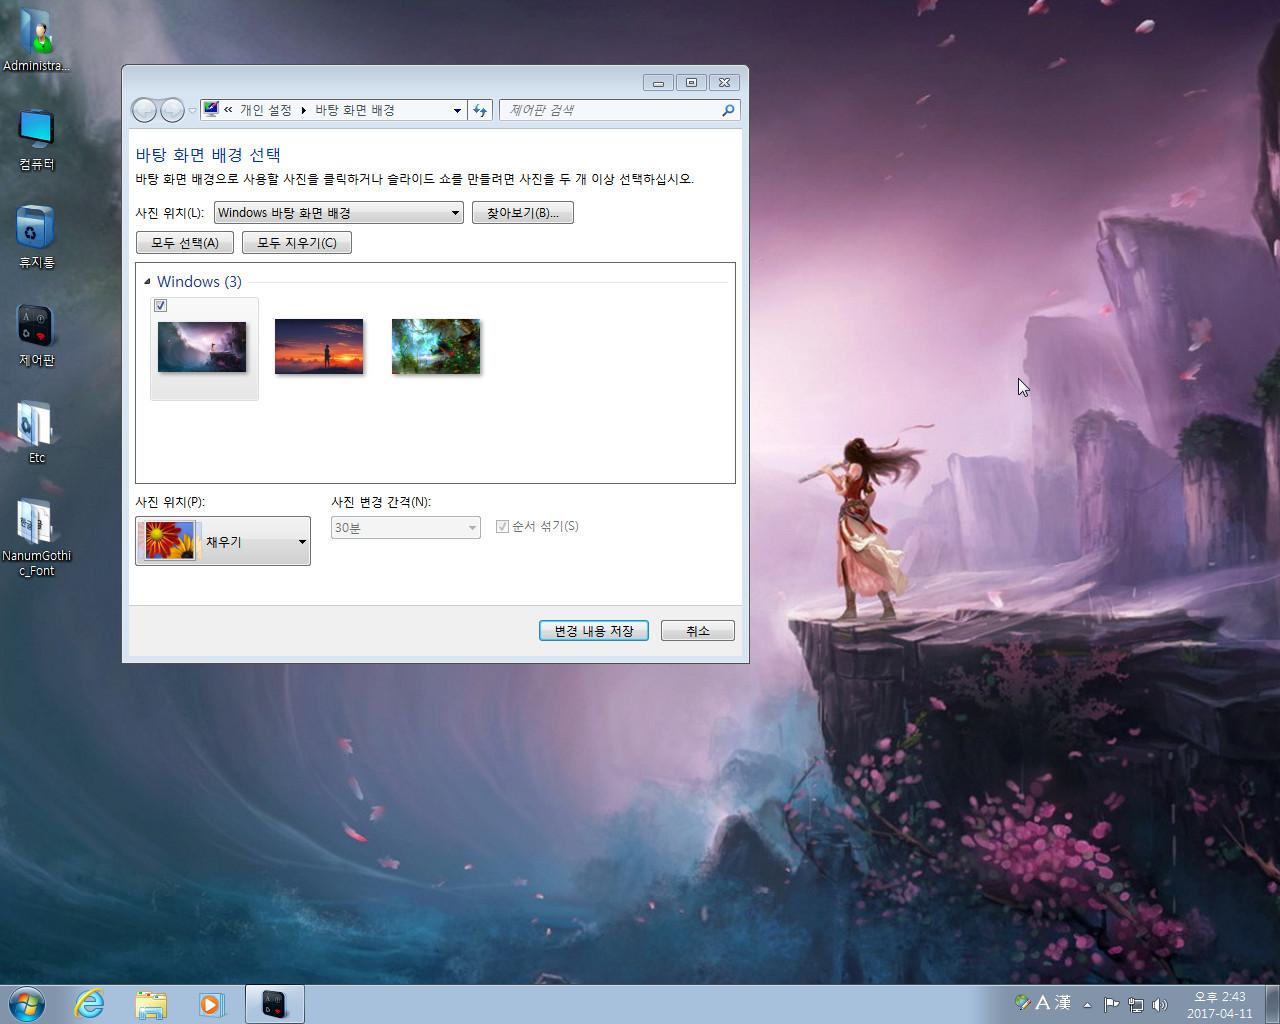 Windows 7 Ultimate_x64_Lite_KO_KY_OldMaC13.jpg